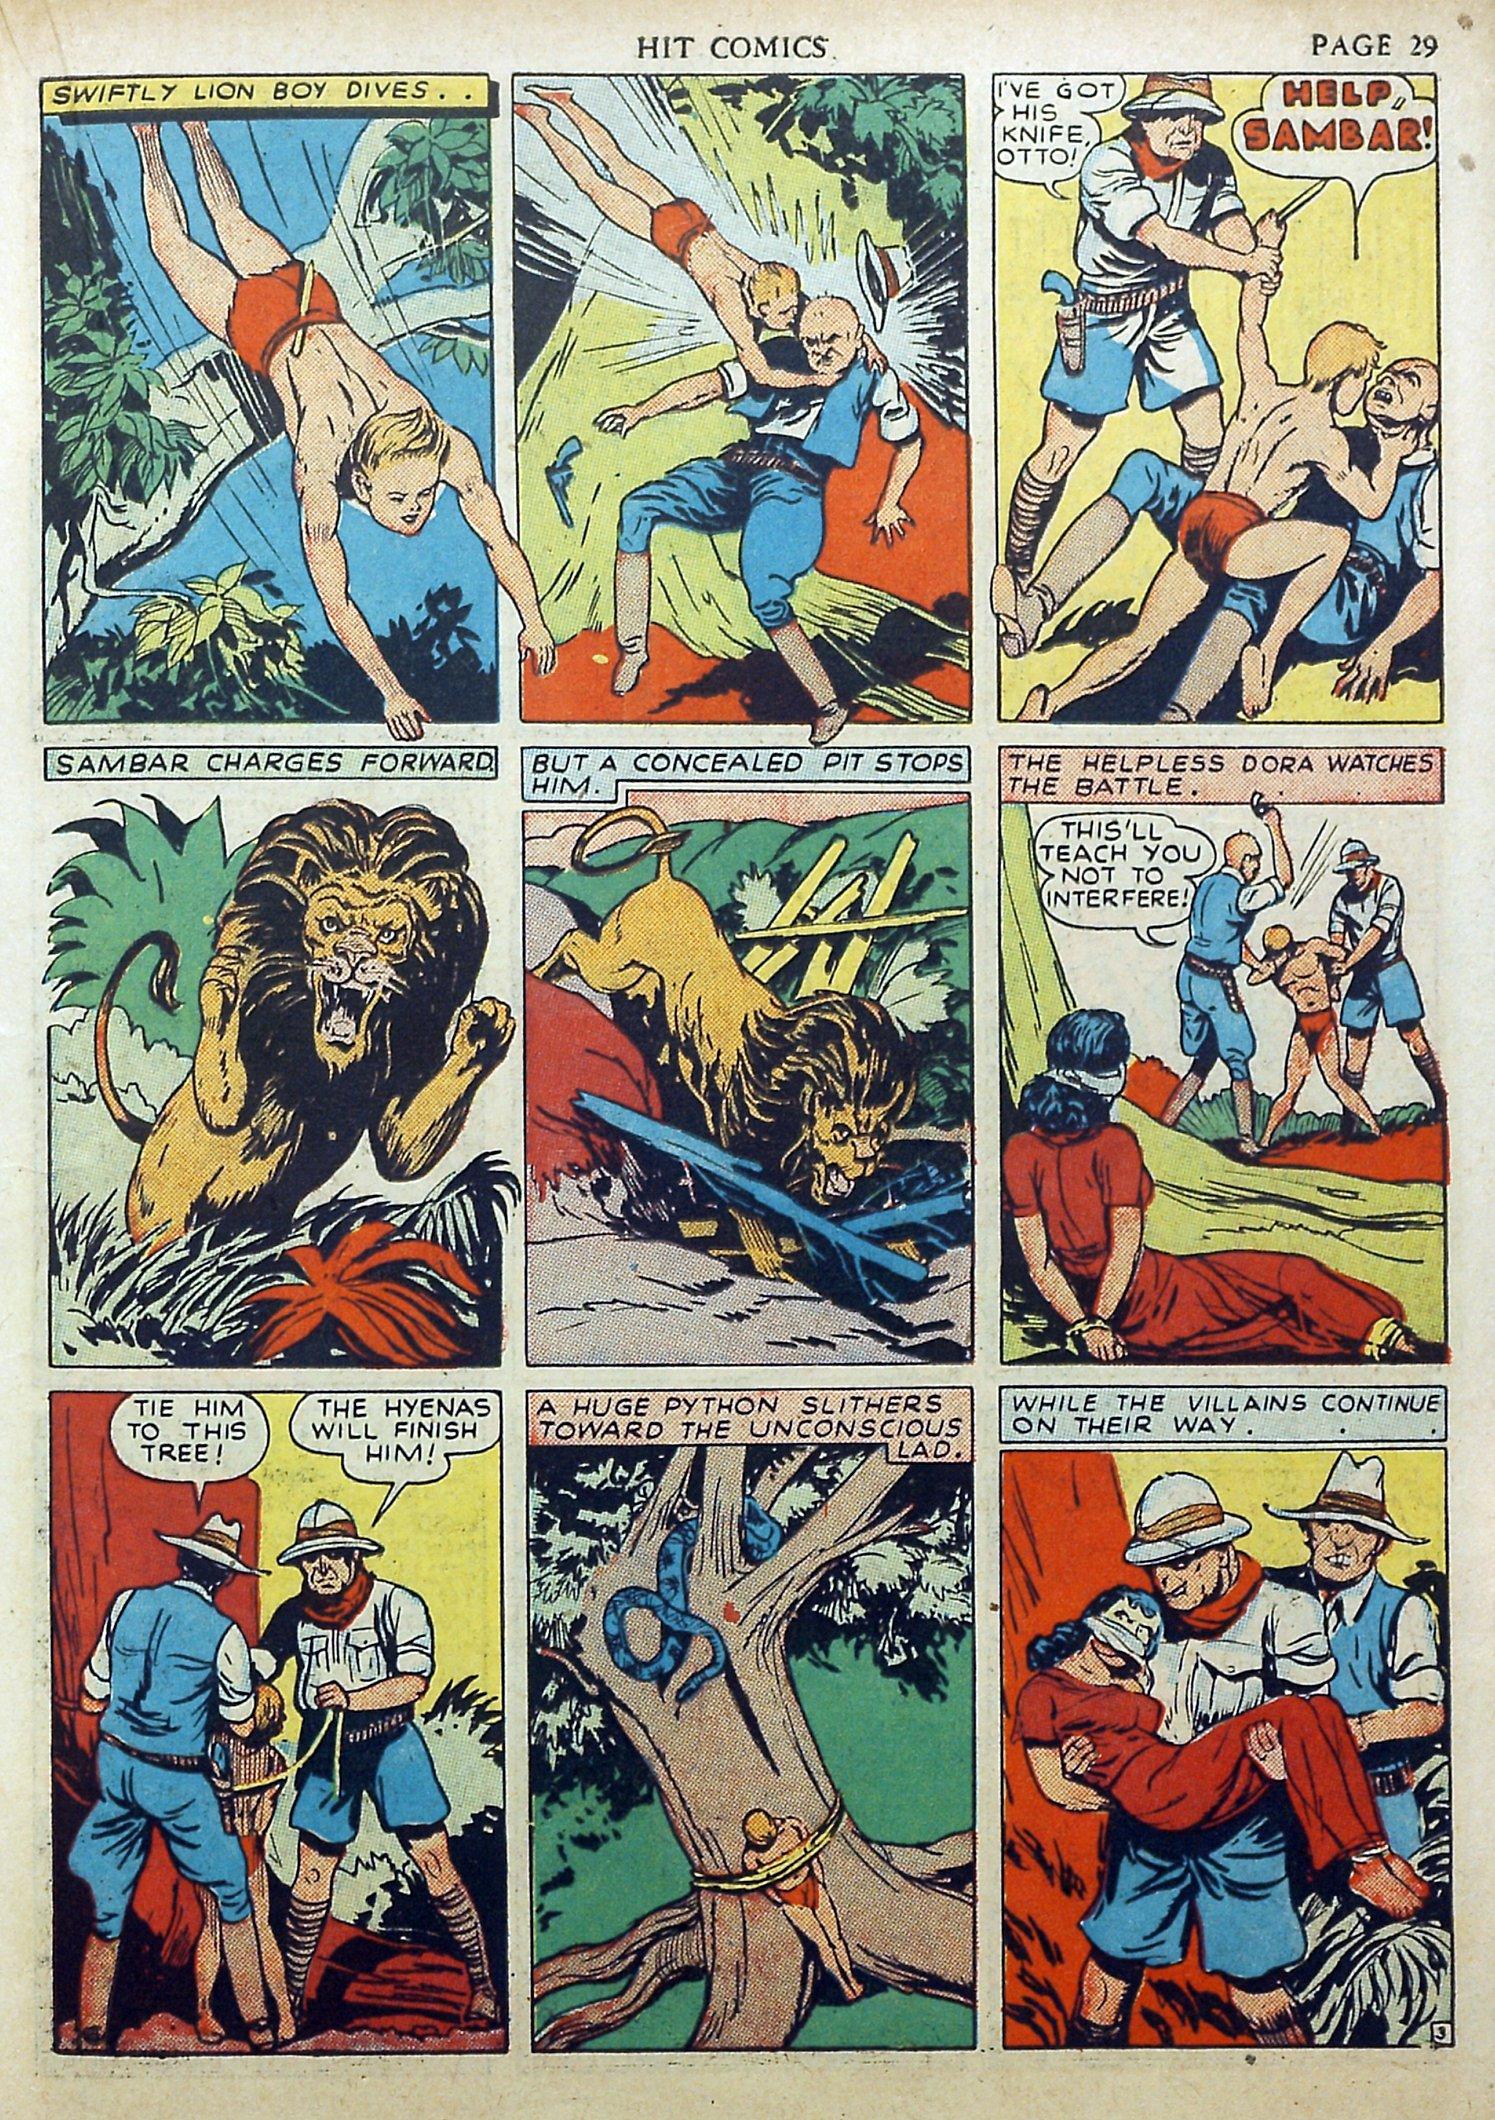 Read online Hit Comics comic -  Issue #17 - 31